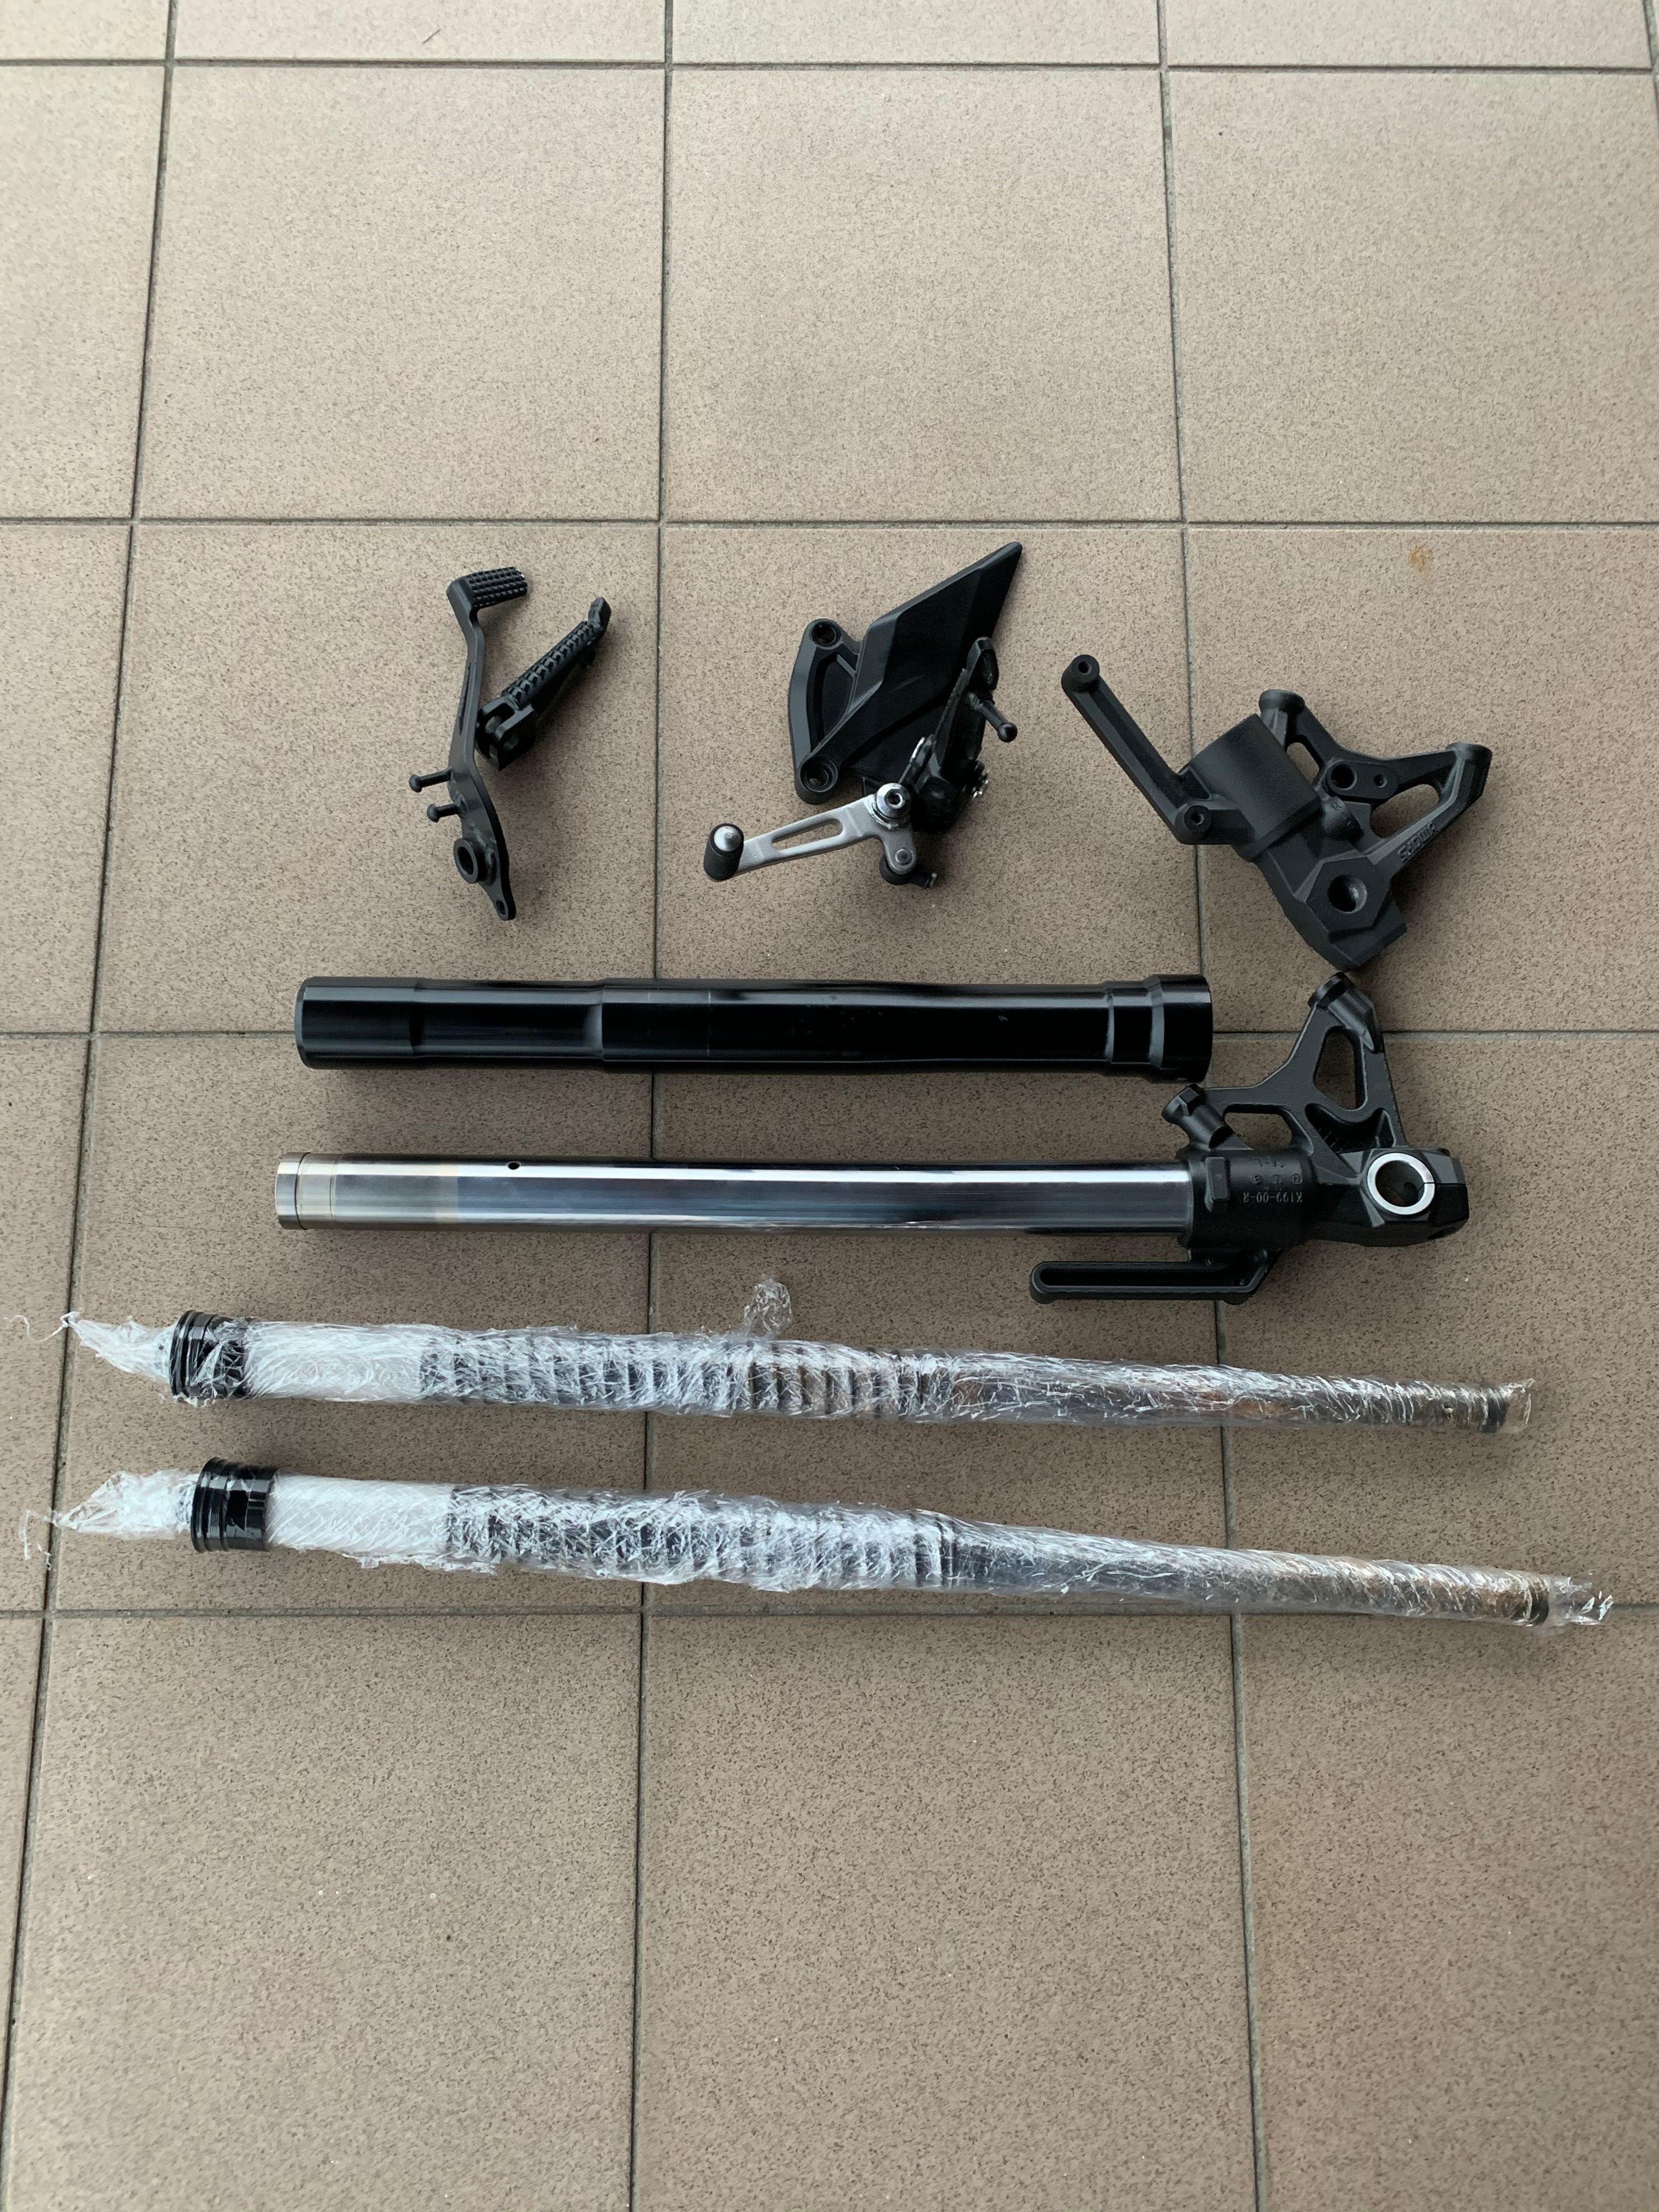 kawasaki Z1000 Z1000XS 2010-1018 piese scarite suspensi